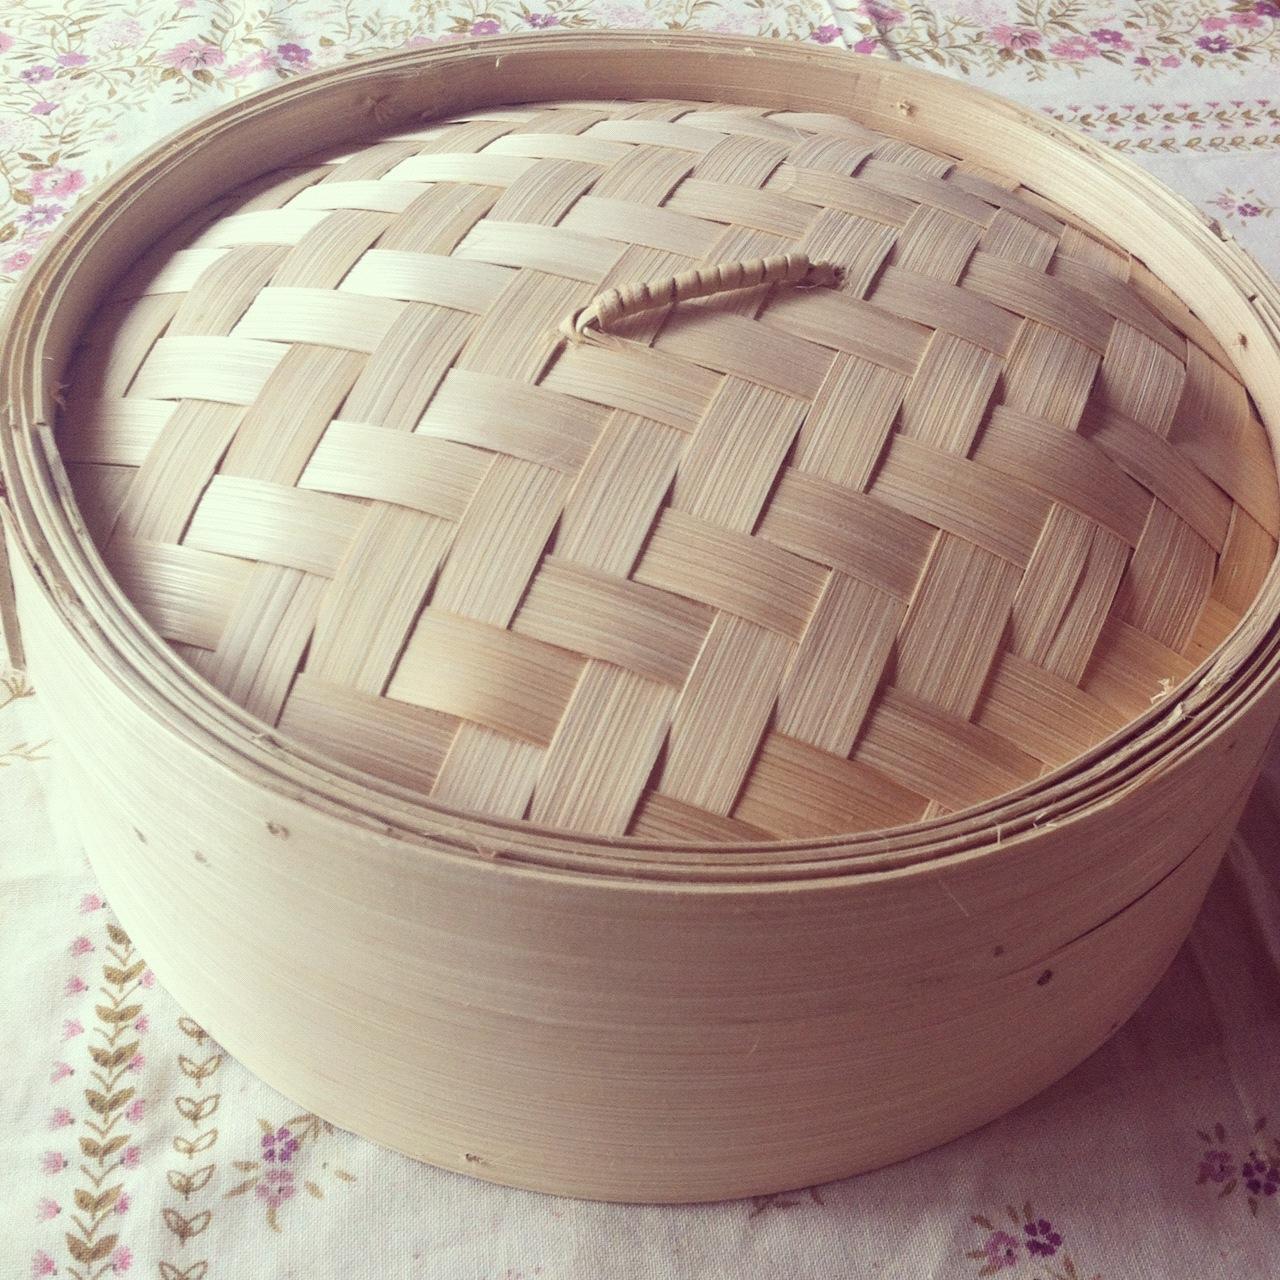 Little bubalishka bamboo circle shelf diy for Things you can make with bamboo